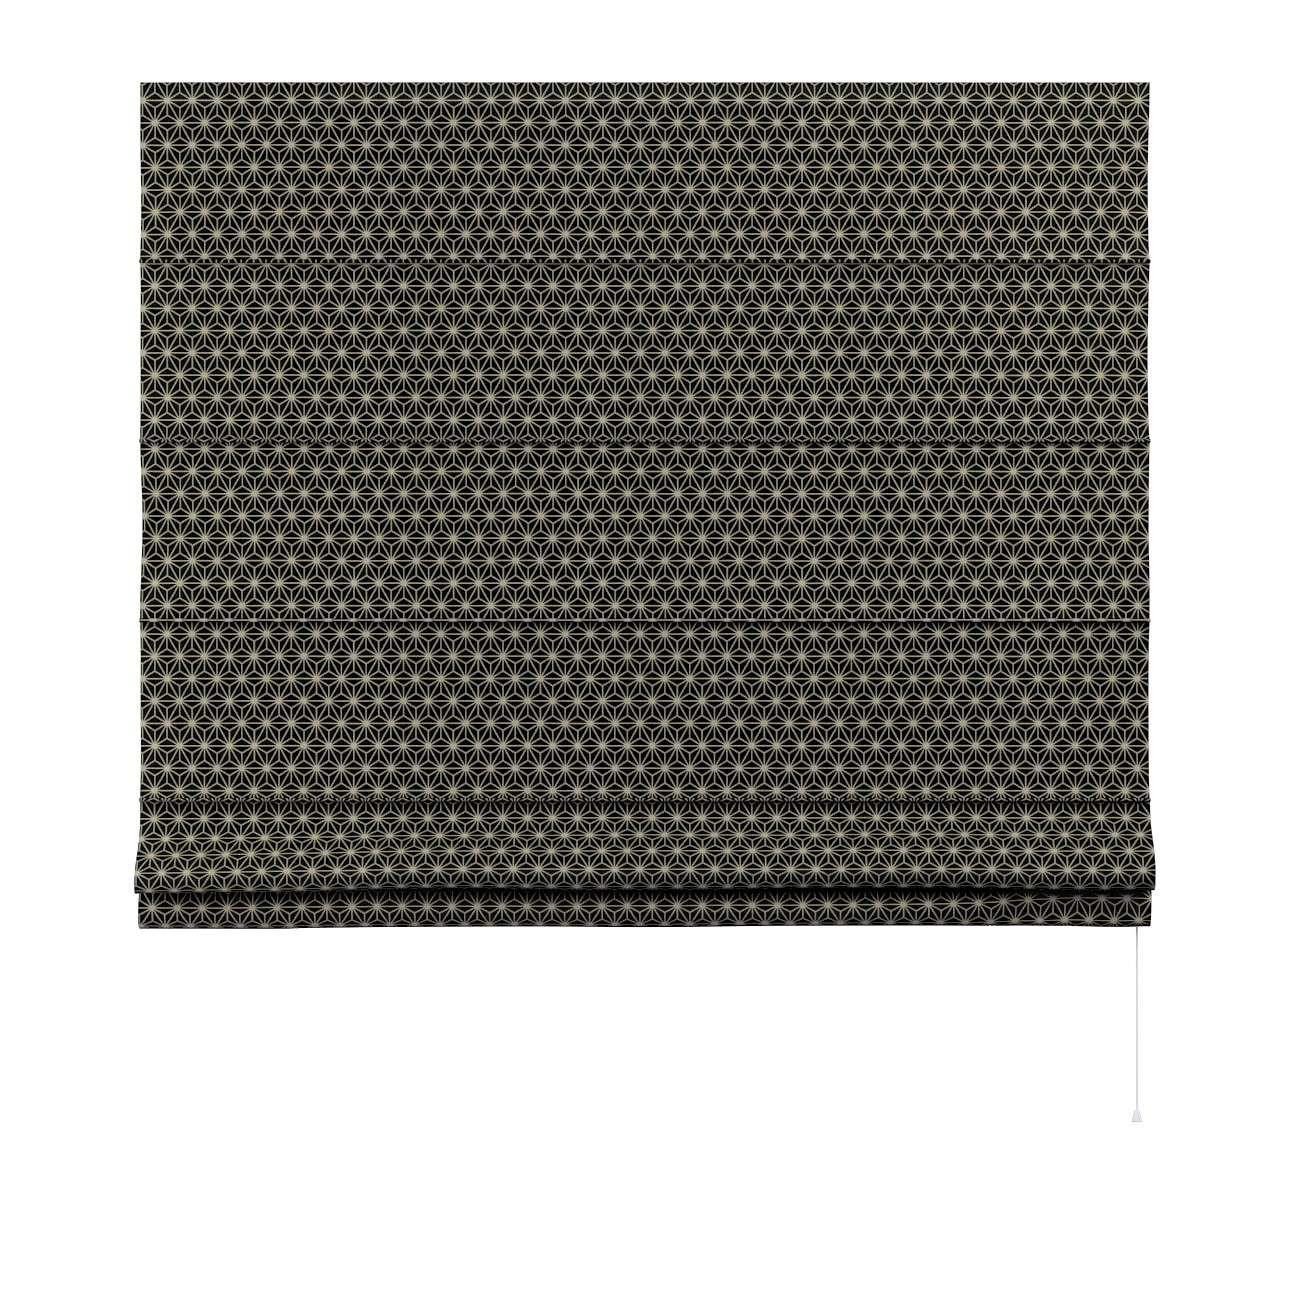 Rímska roleta Capri V kolekcii Black & White, tkanina: 142-56